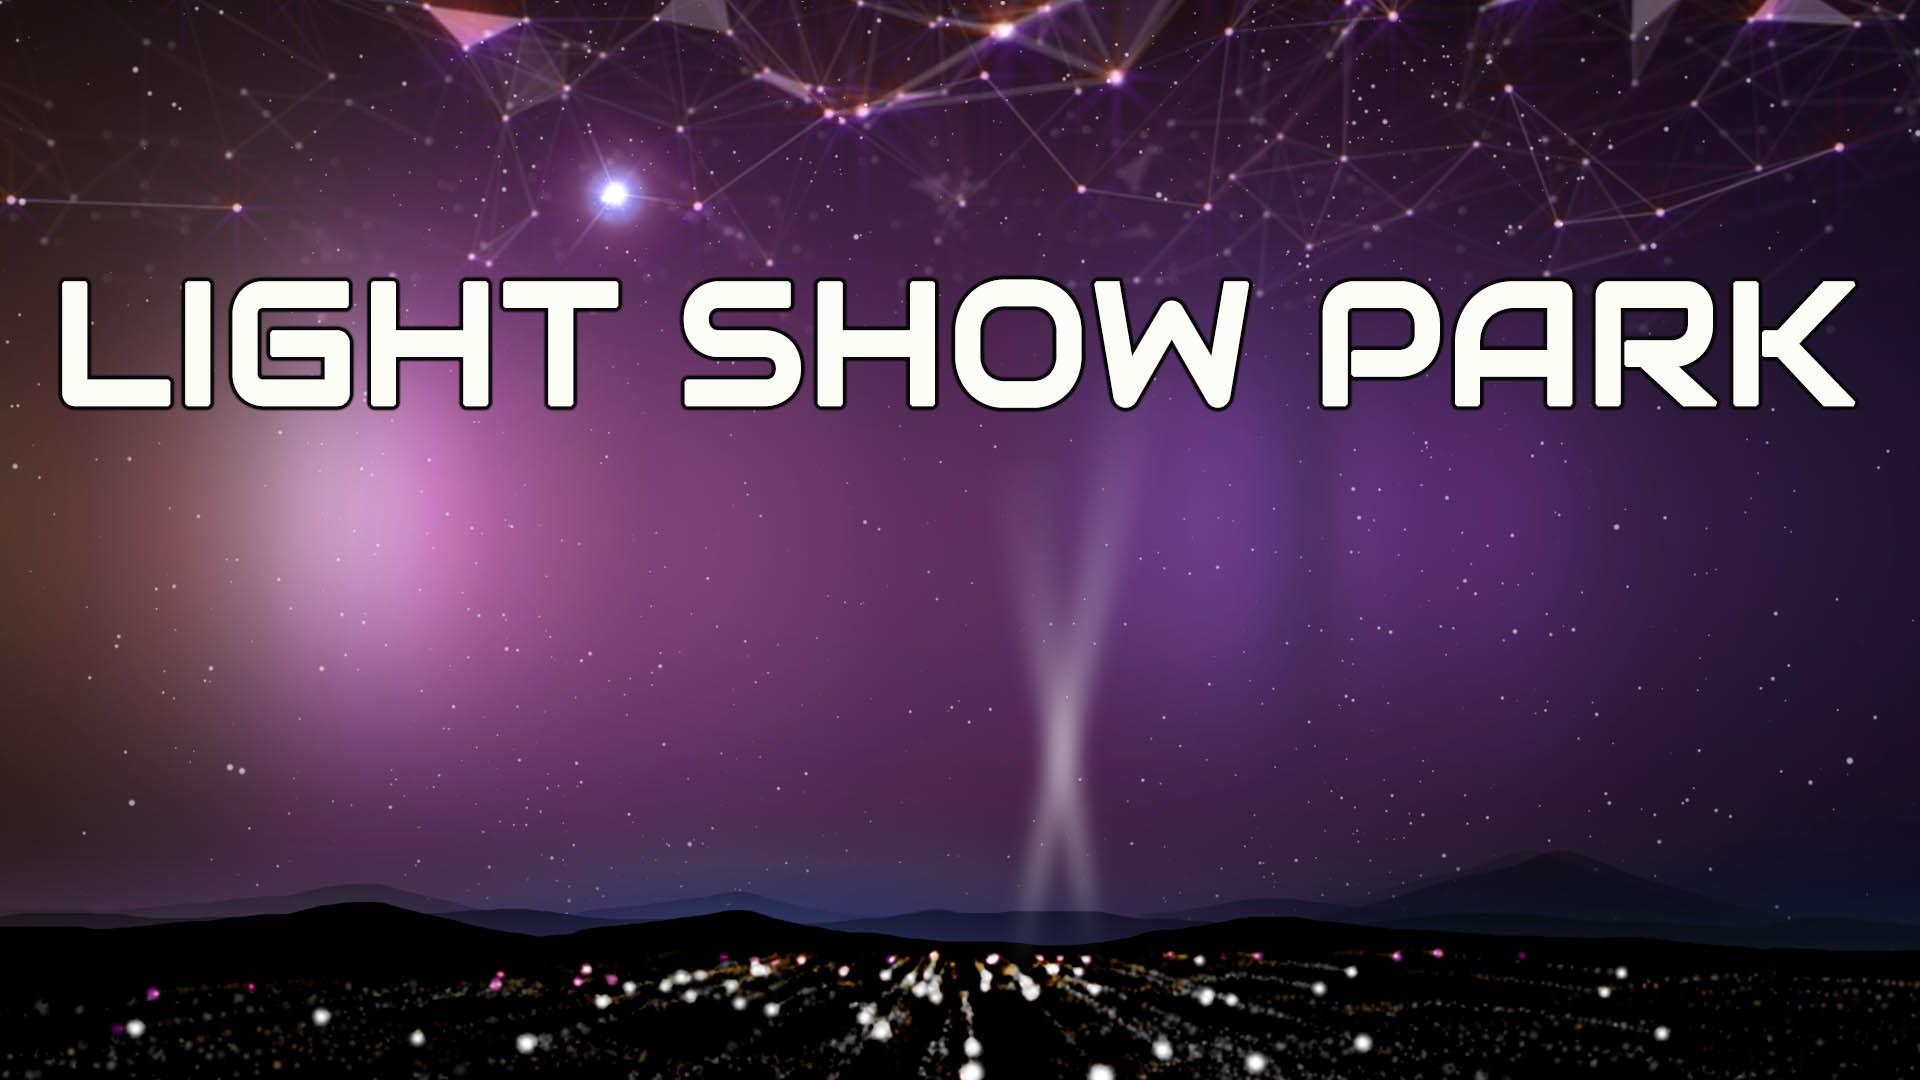 LIGHT SHOW PARK.jpg